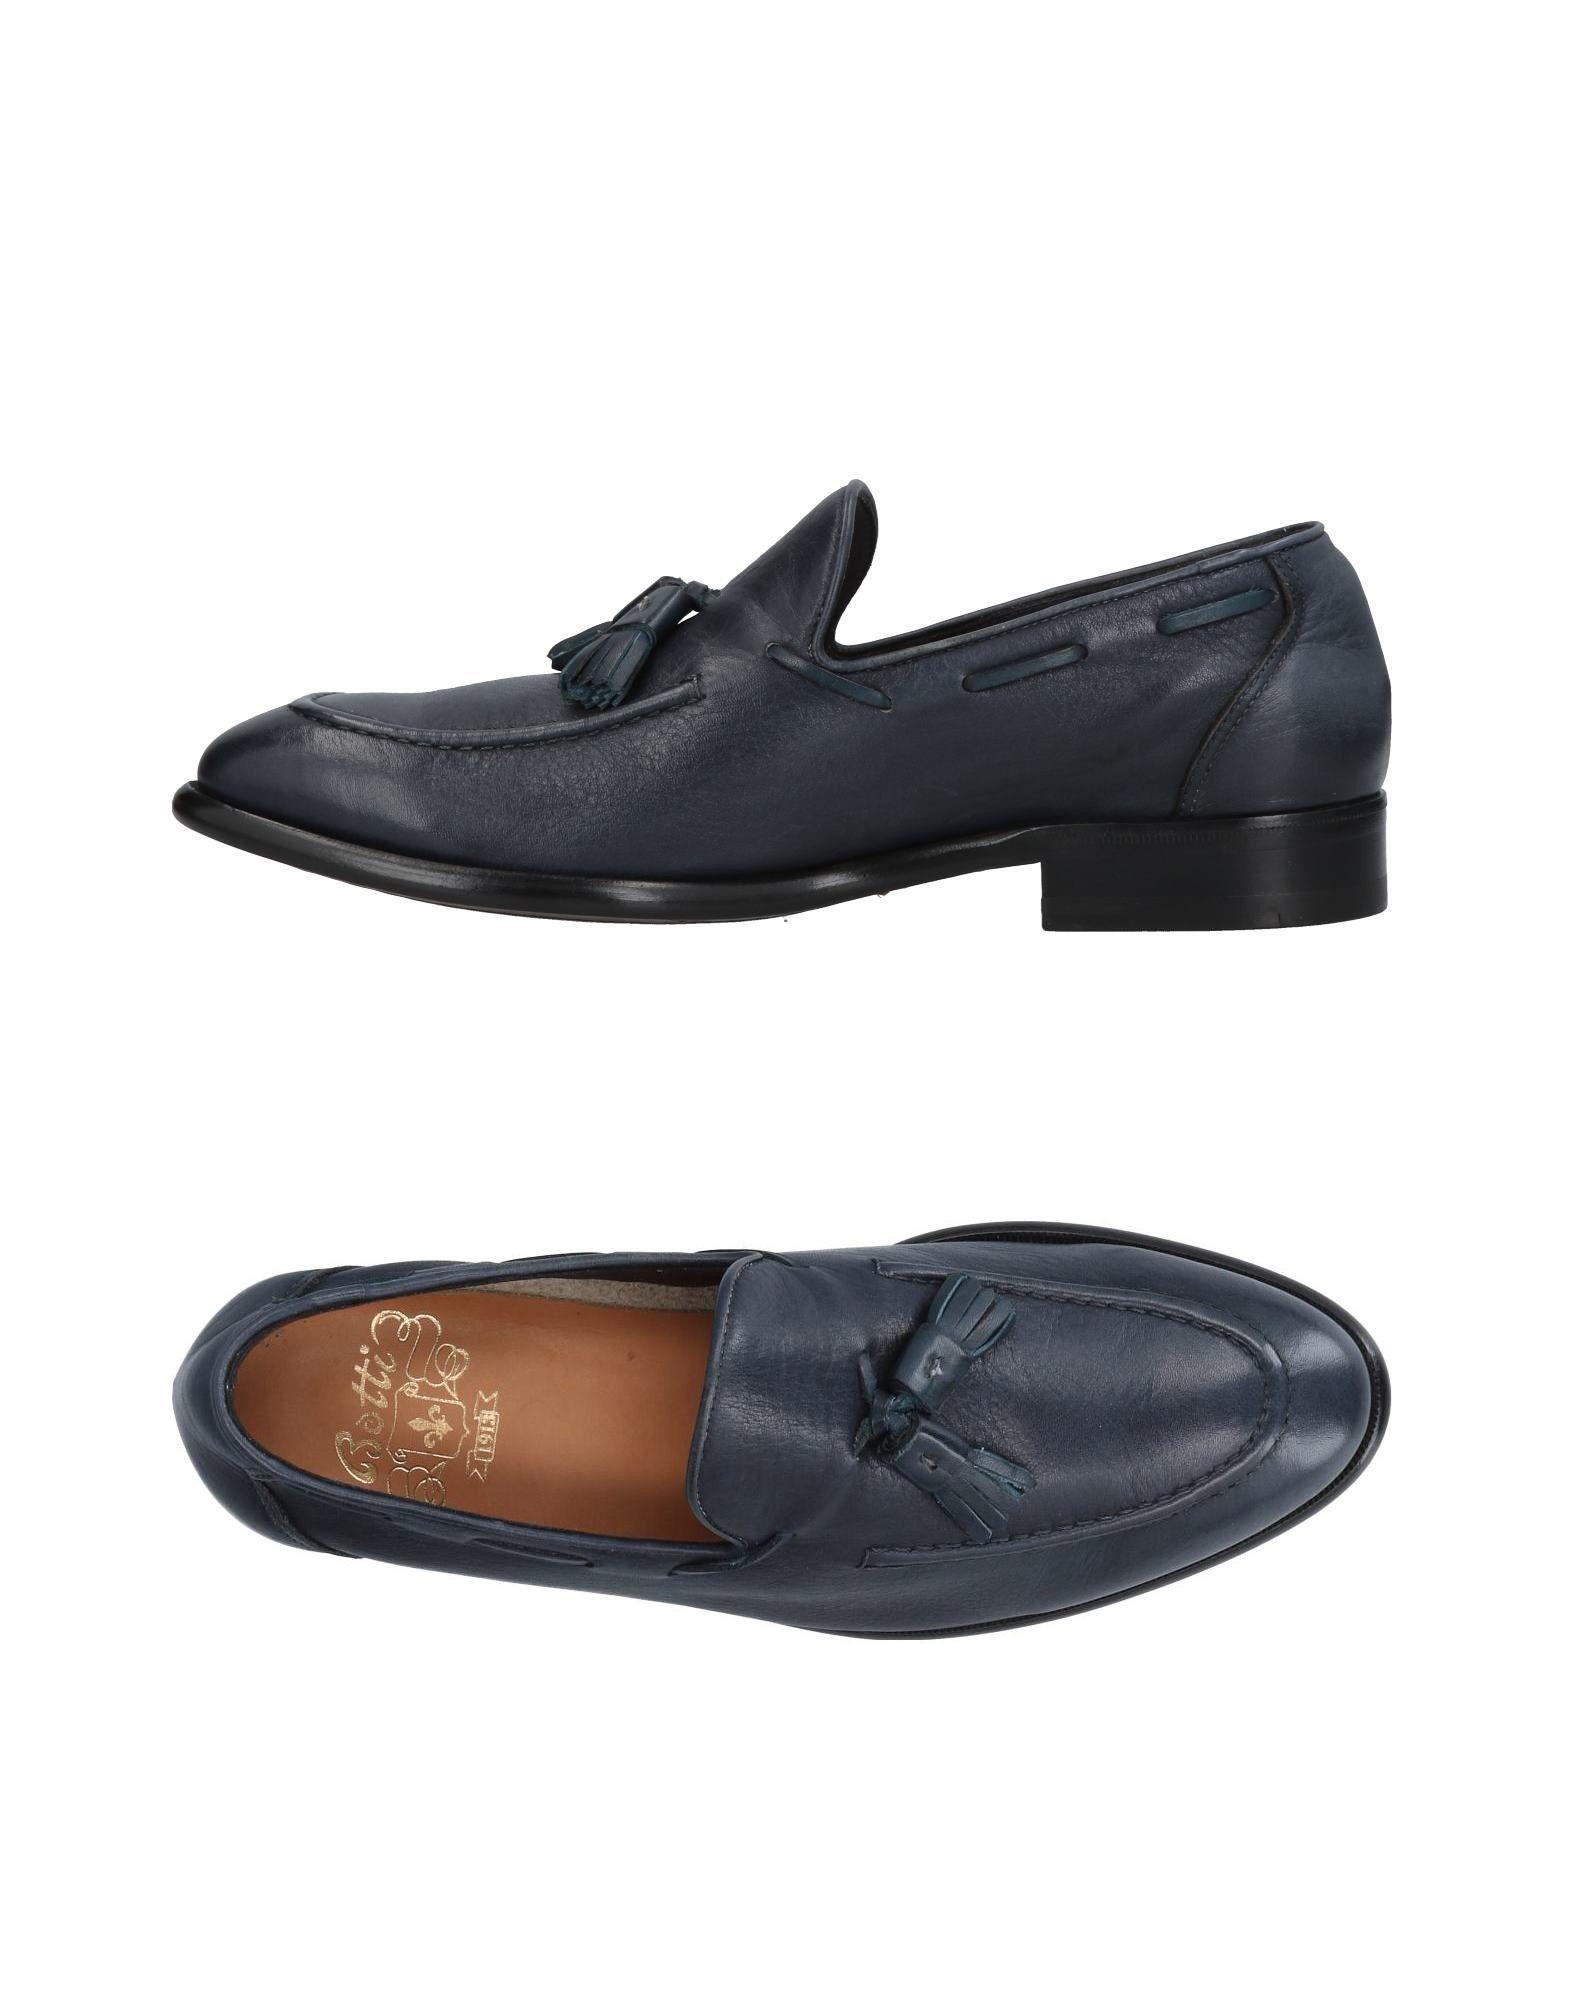 Botti Mokassins Herren  11461916KK Gute Qualität beliebte Schuhe